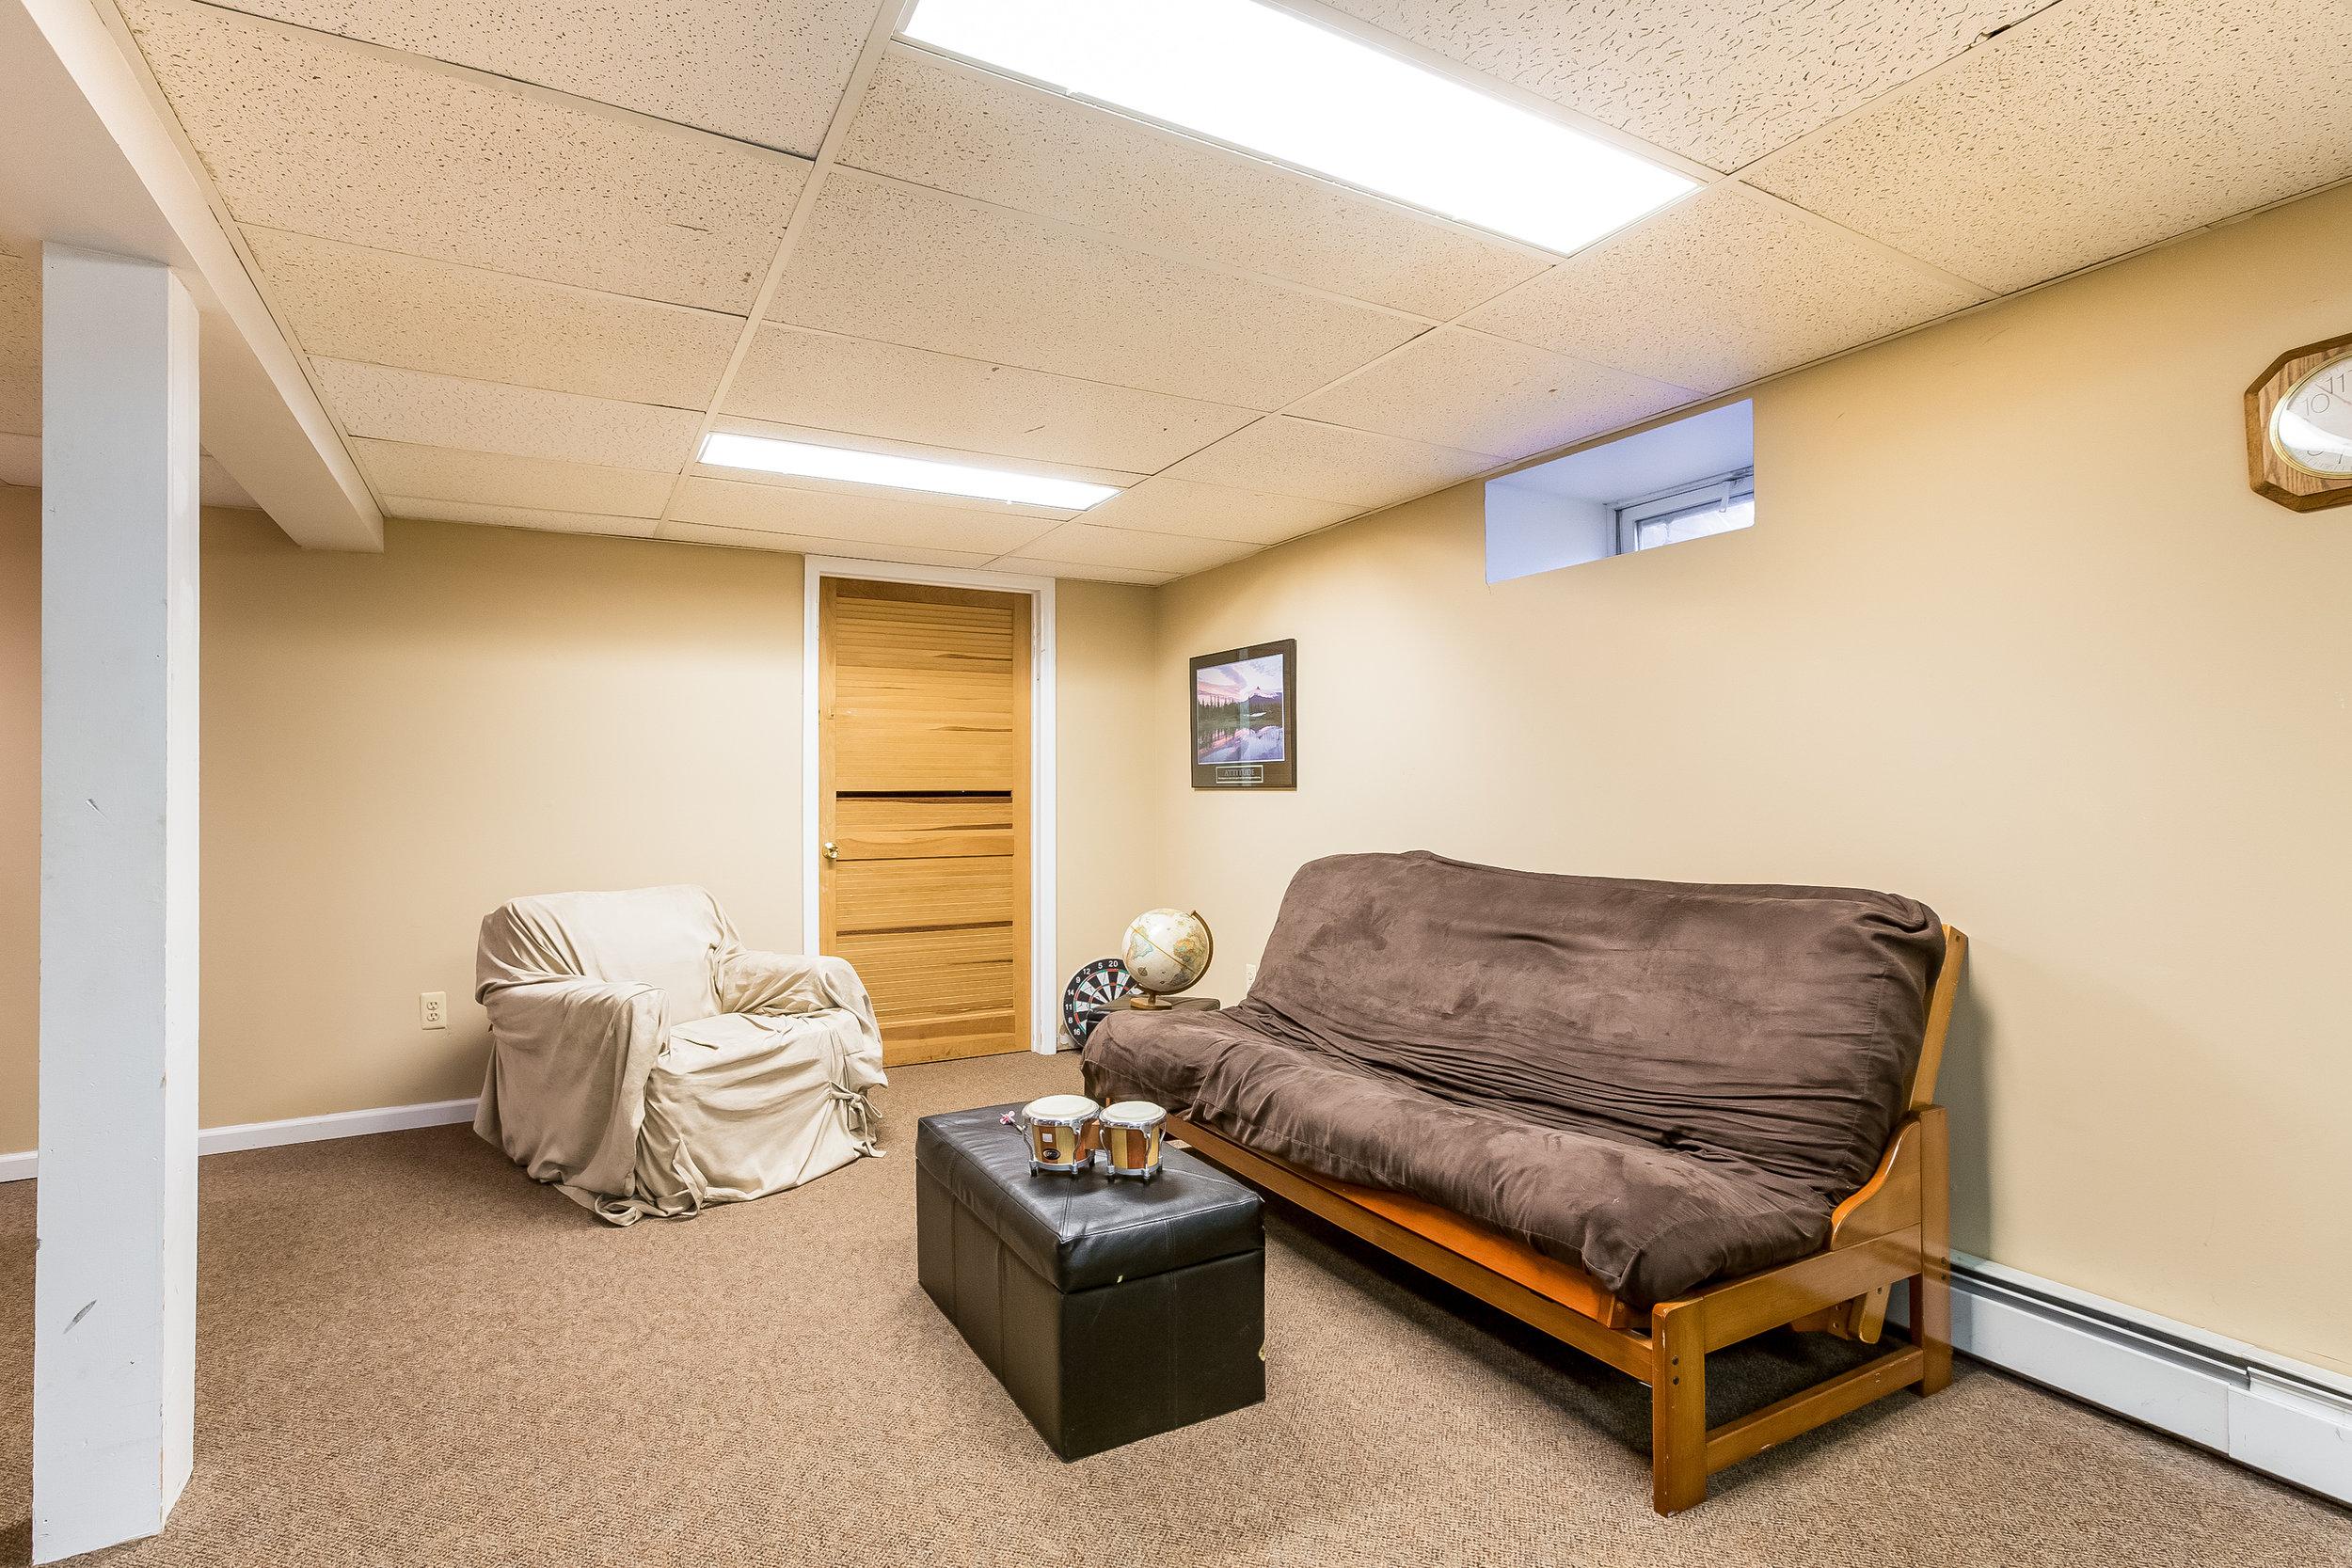 041-Recreation_Room-5002175-large.jpg